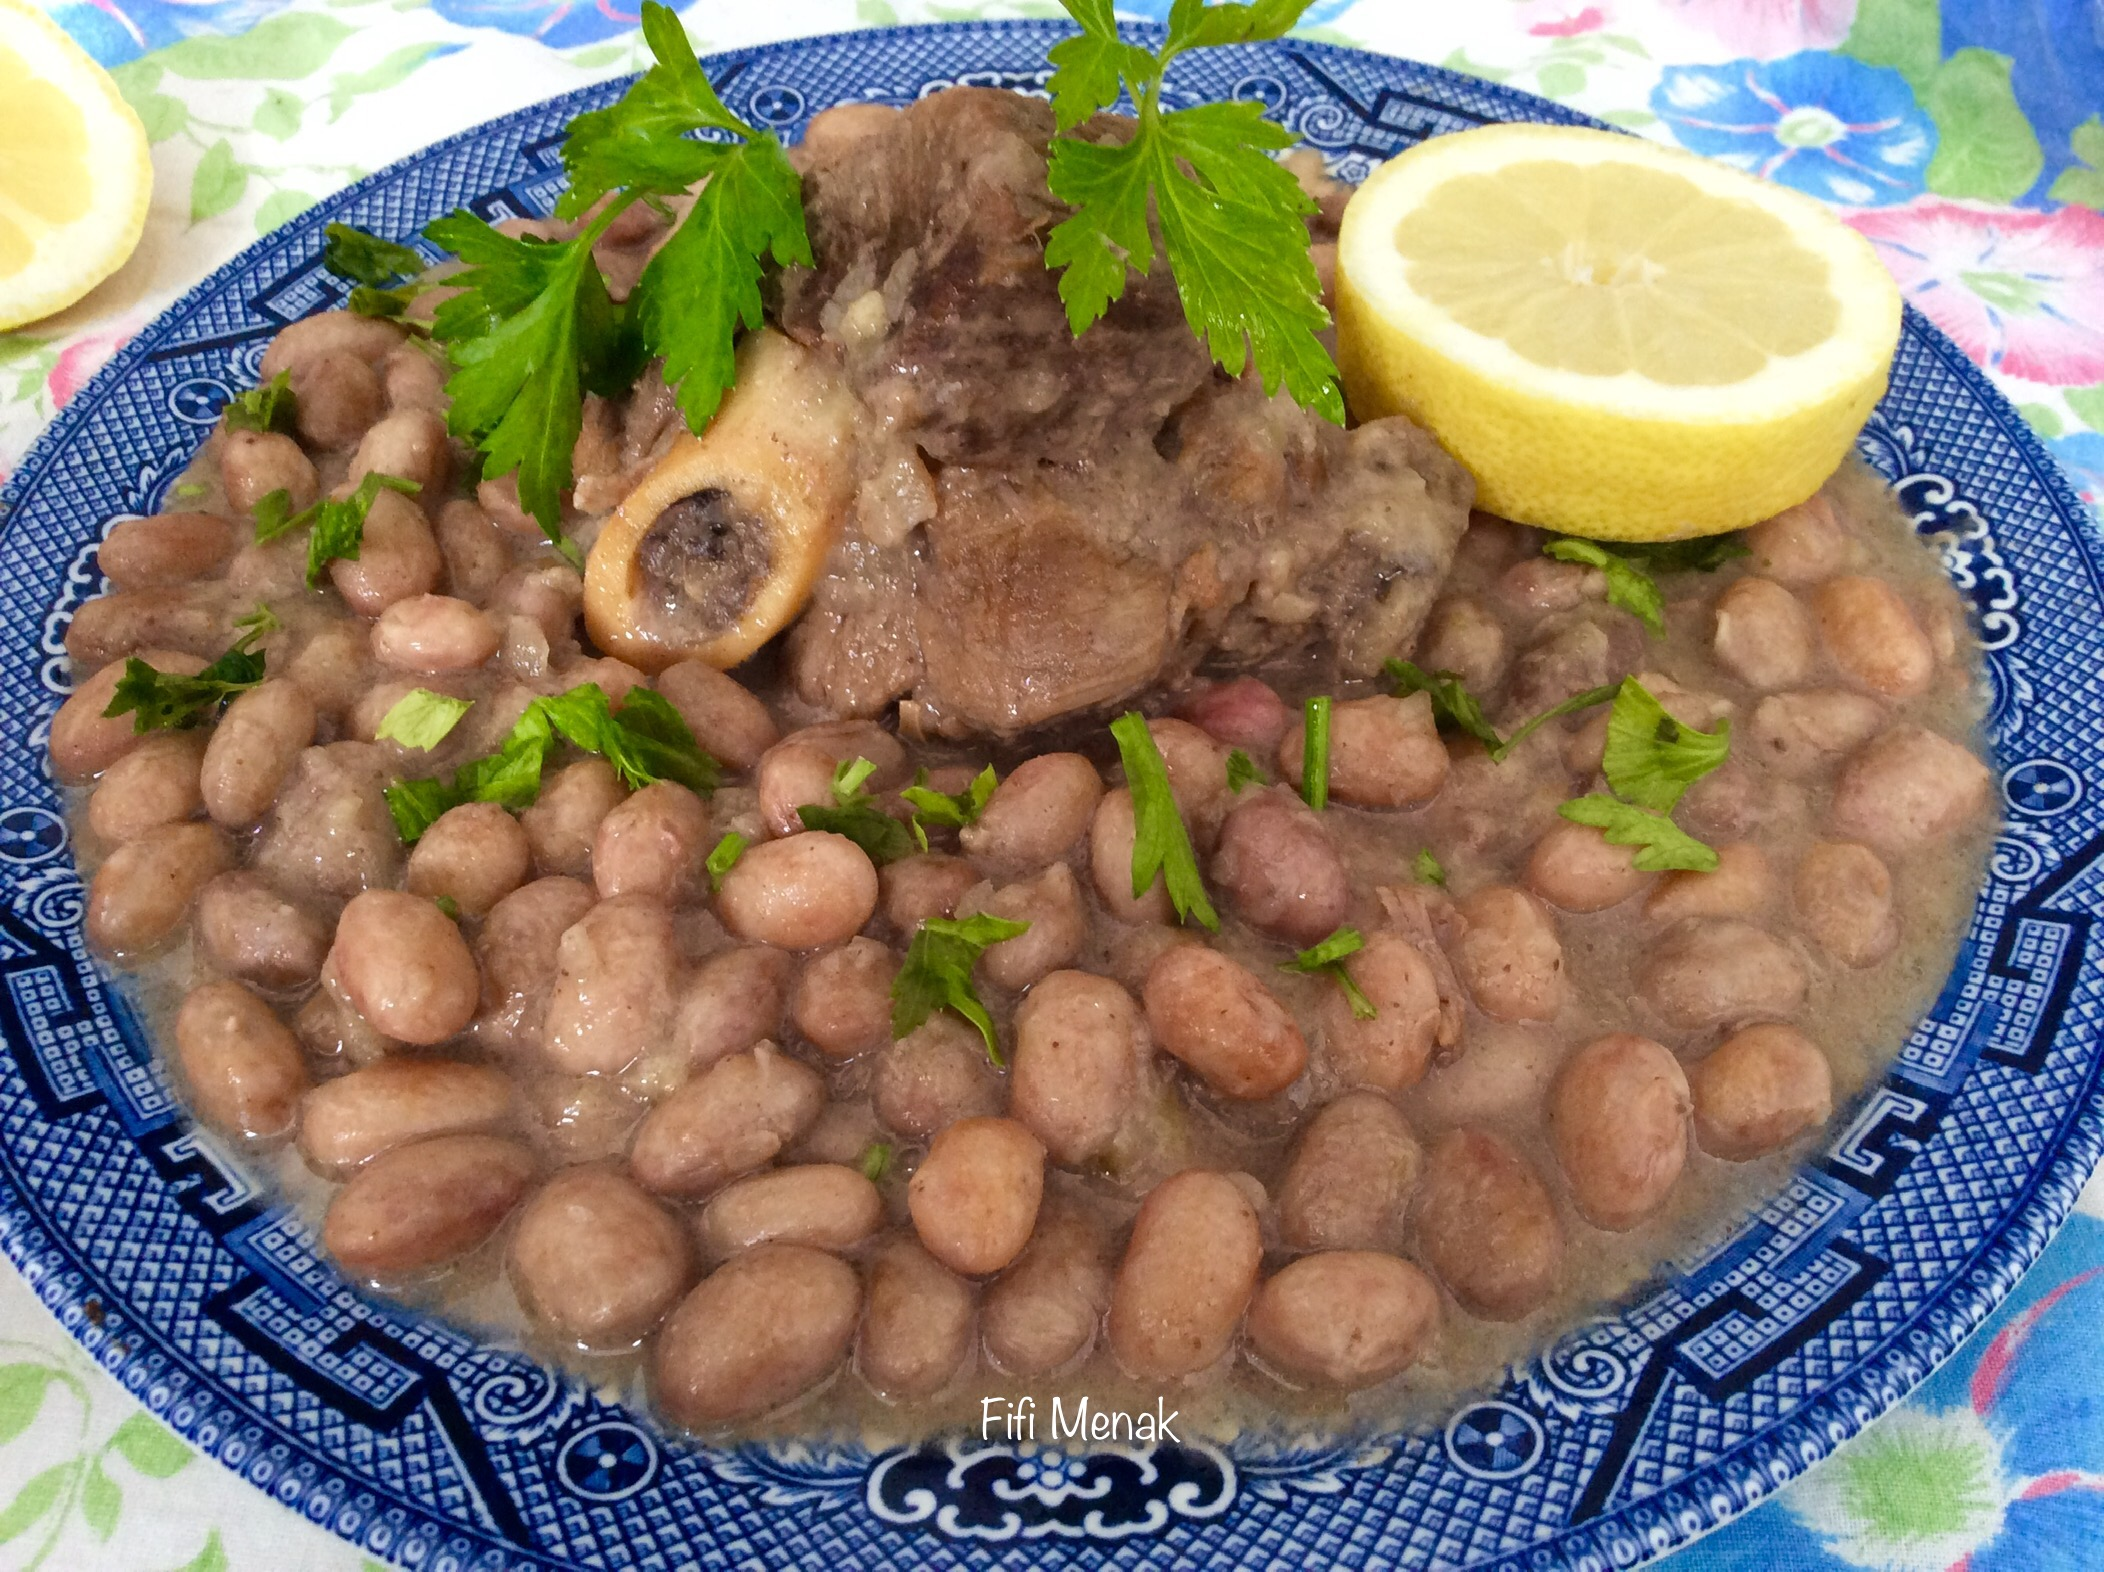 Haricots blancs frais en sauce blanche (Loubia fessassa marqa bida)